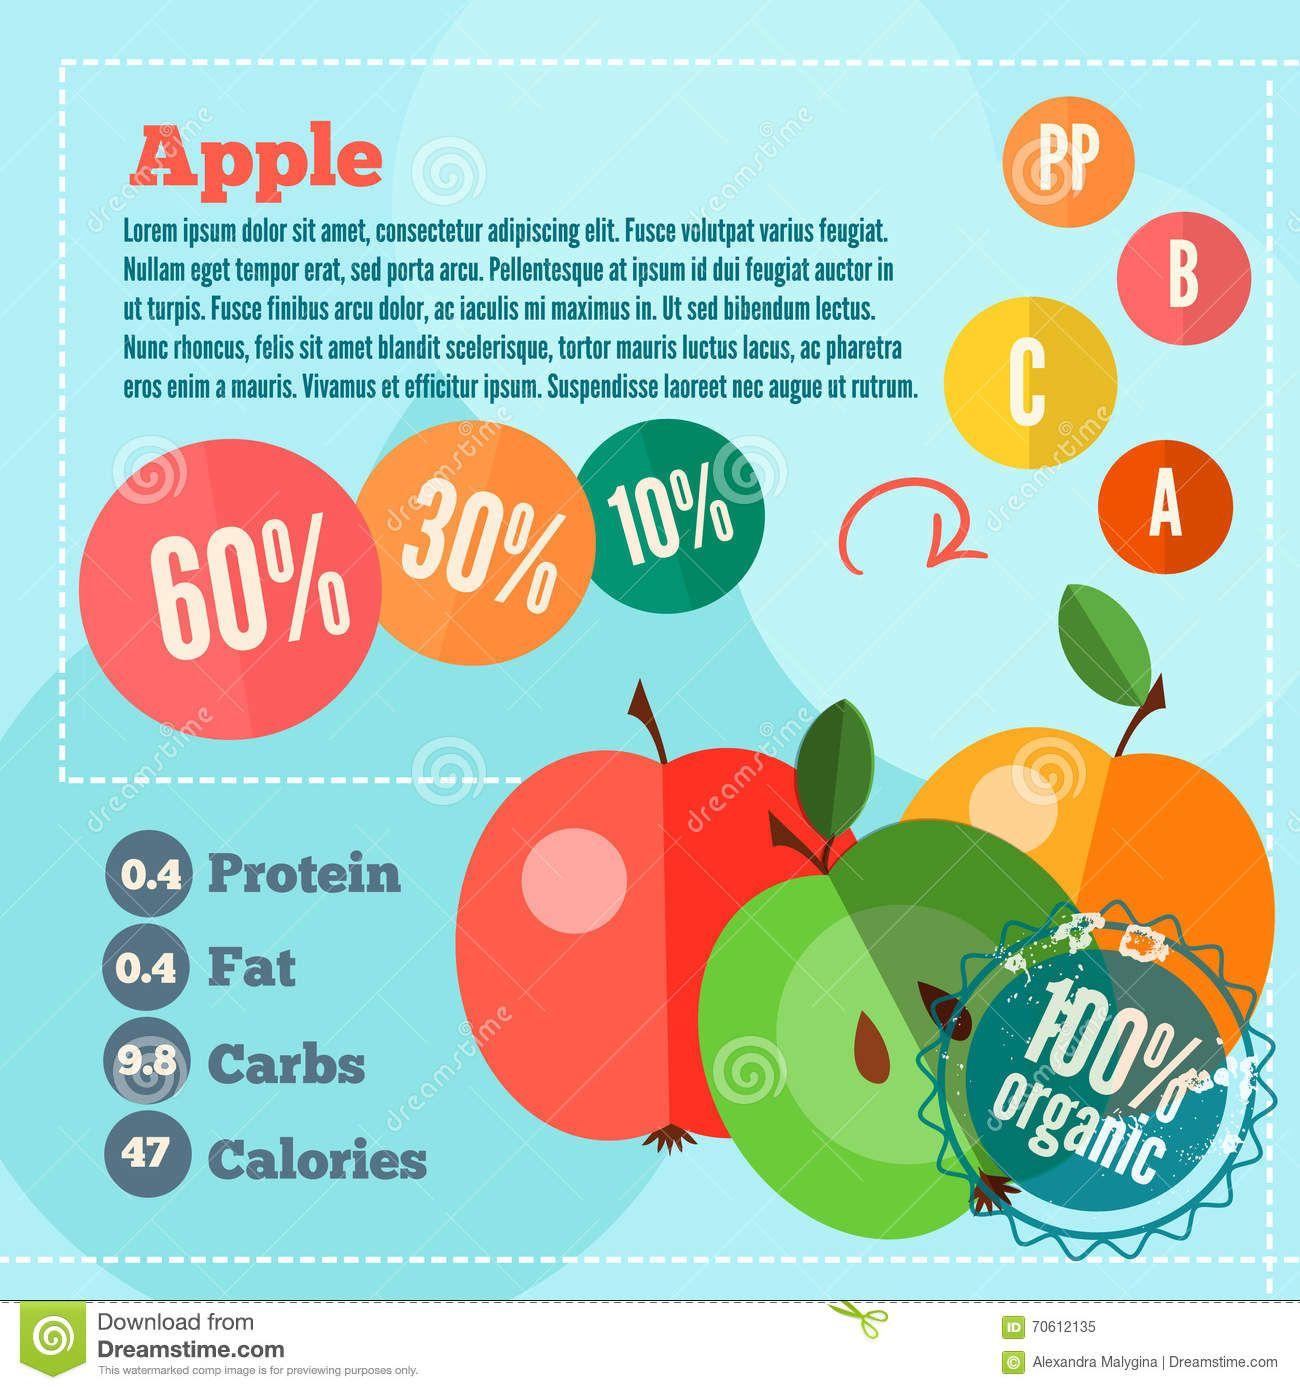 Pin By Prashant Prajapati On Healthy Eating